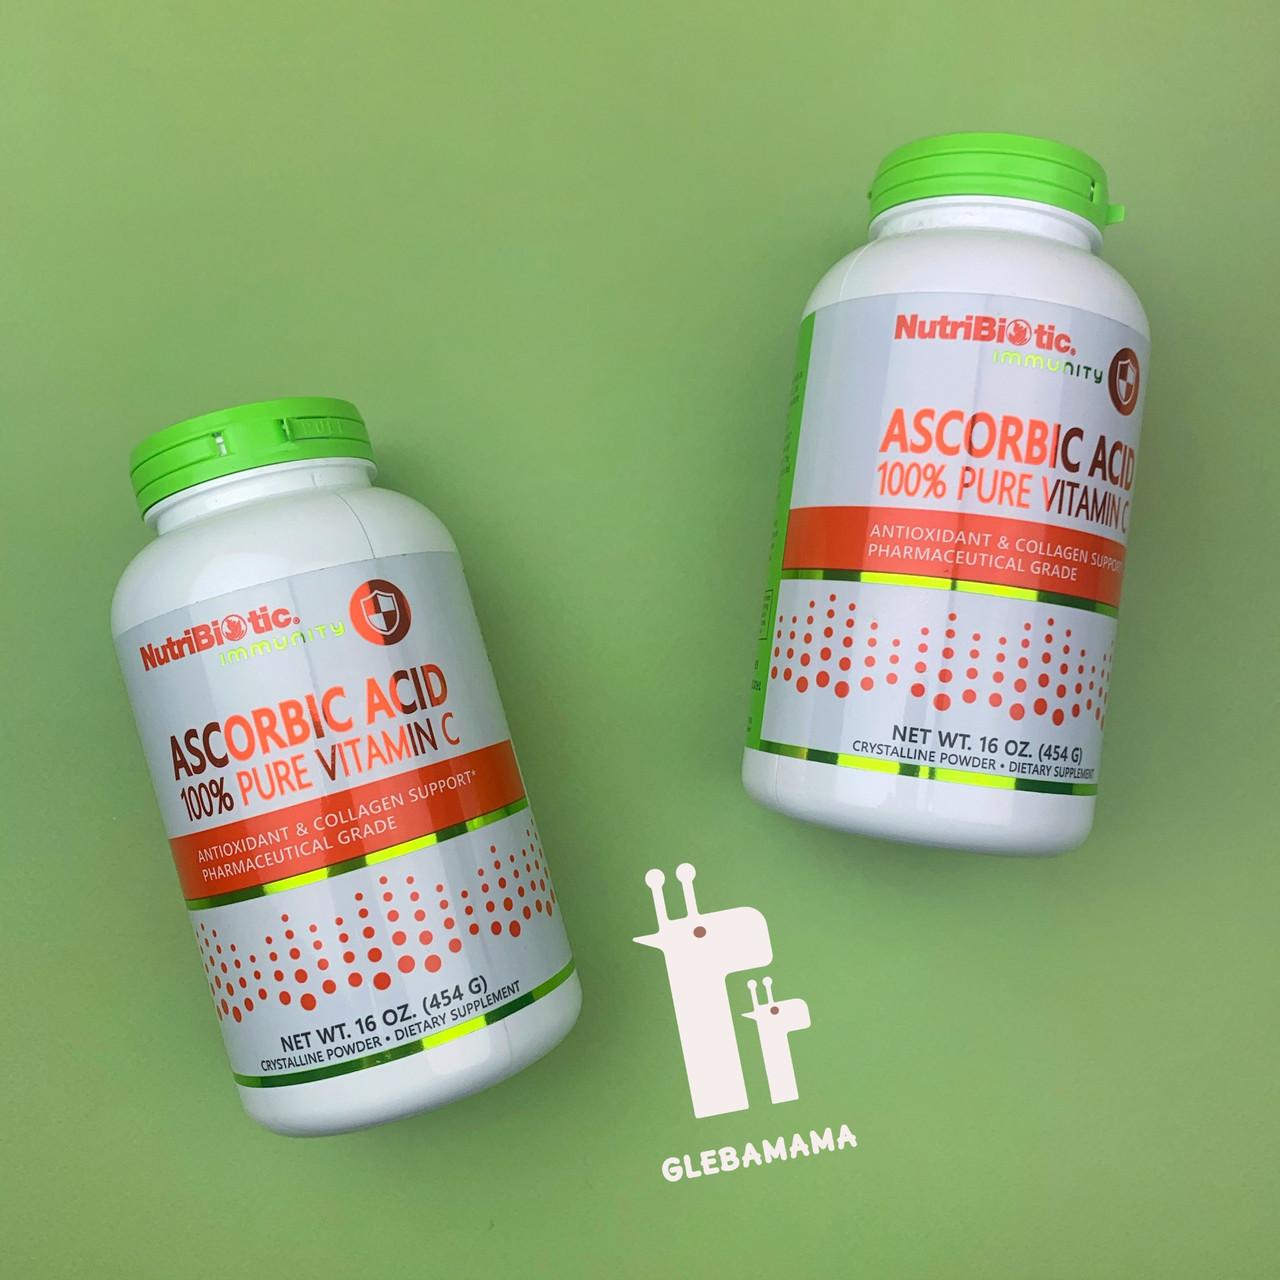 Аскорбиновая кислота, 100% витамин С, 454 гр